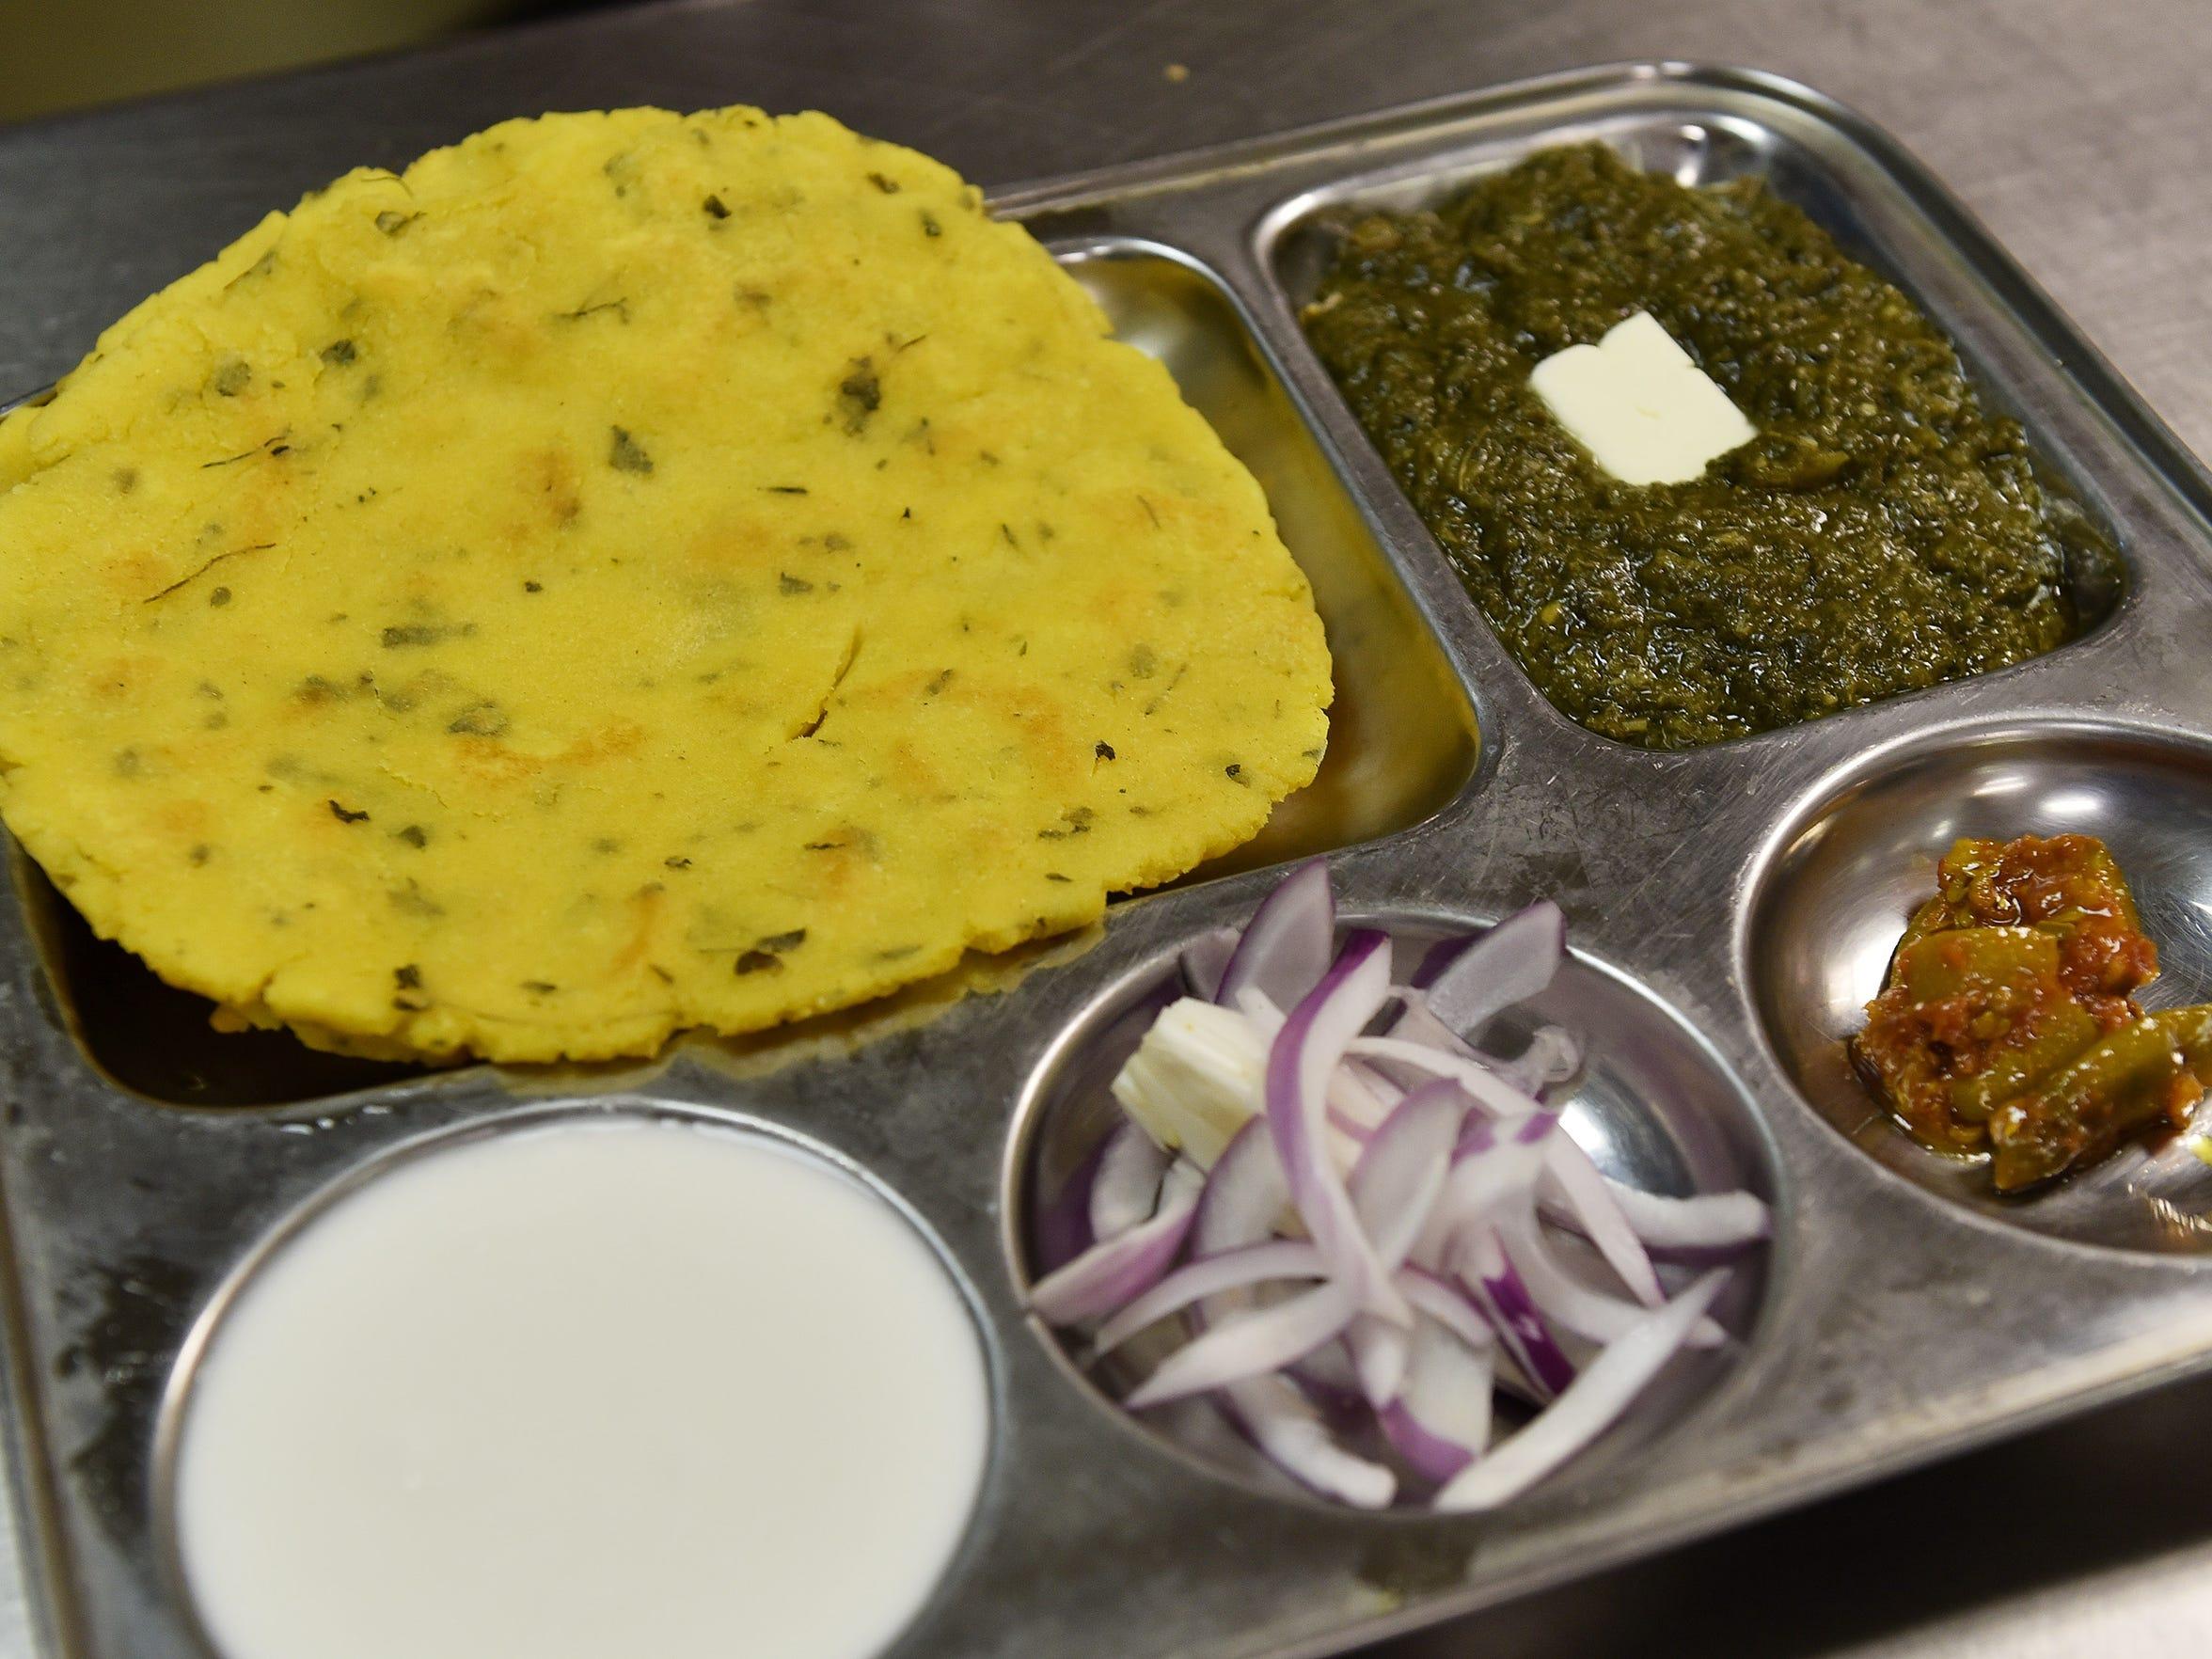 Maki Roti & Saag is Punjabi corn bread served with cooked mustard greens at Phulkari Punjabi Kitchen in Madison Heights.